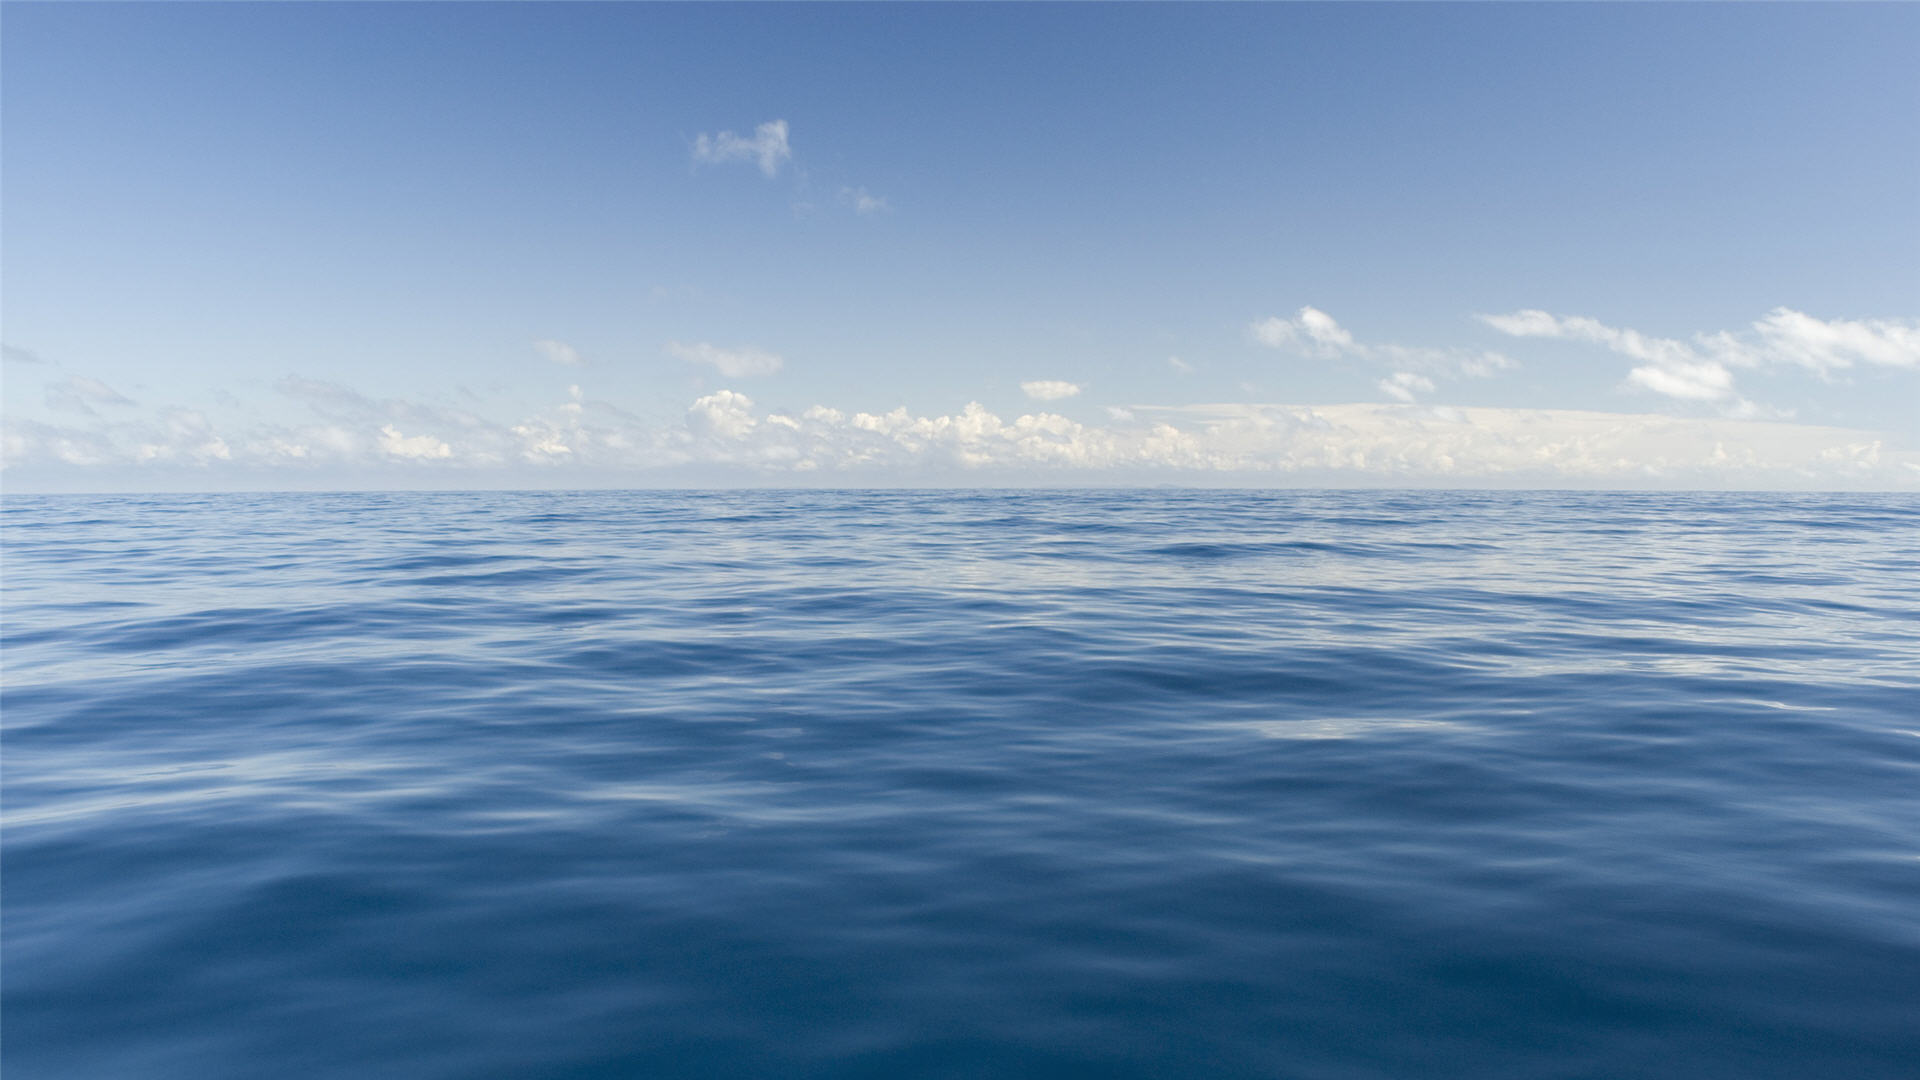 Download Smooth Ocean wallpaper